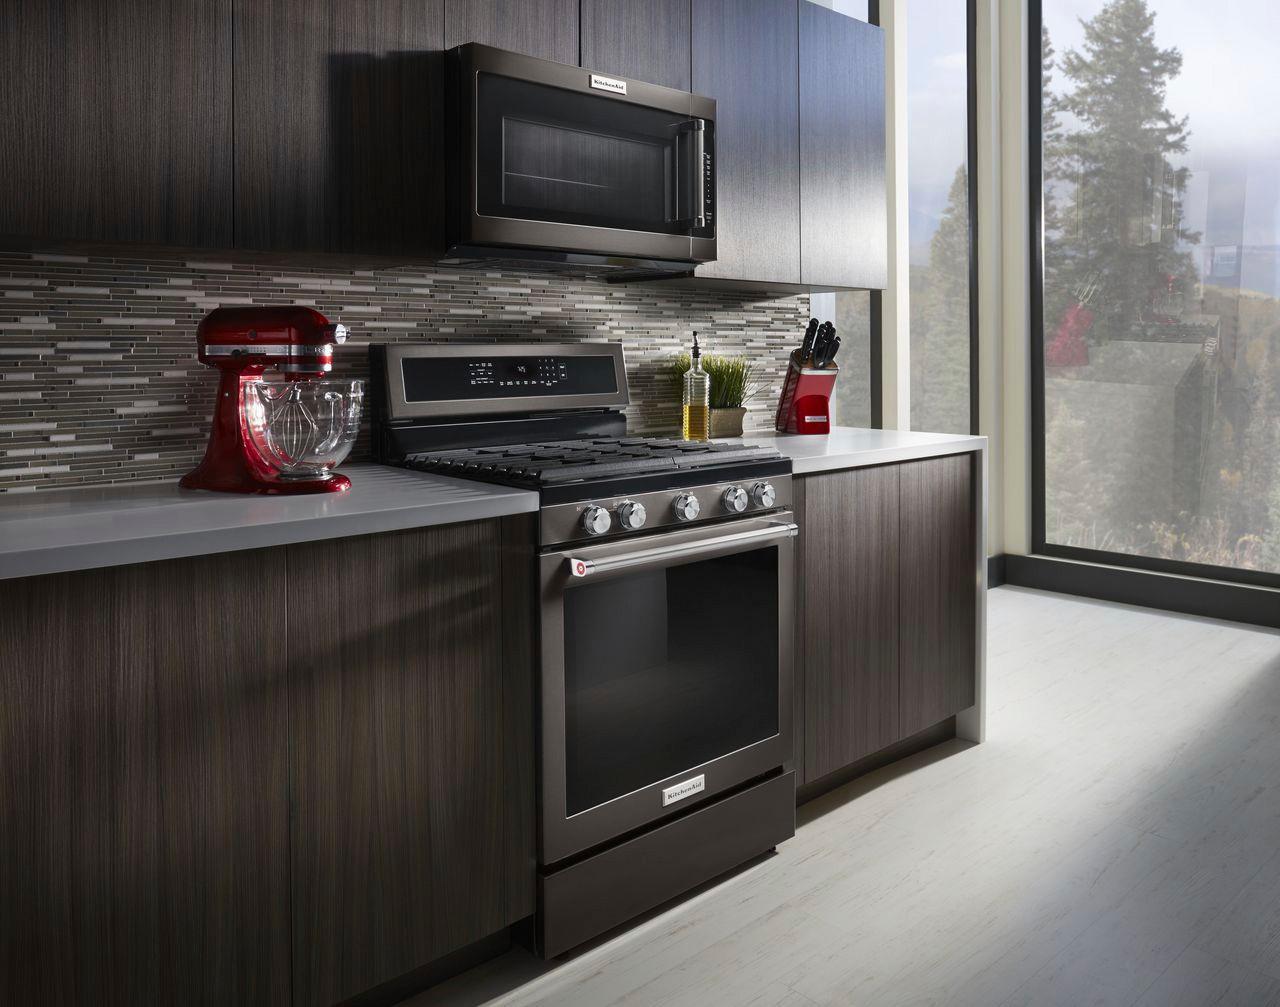 Kitchenaid 2 0 Cu Ft Over The Range Microwave With Sensor